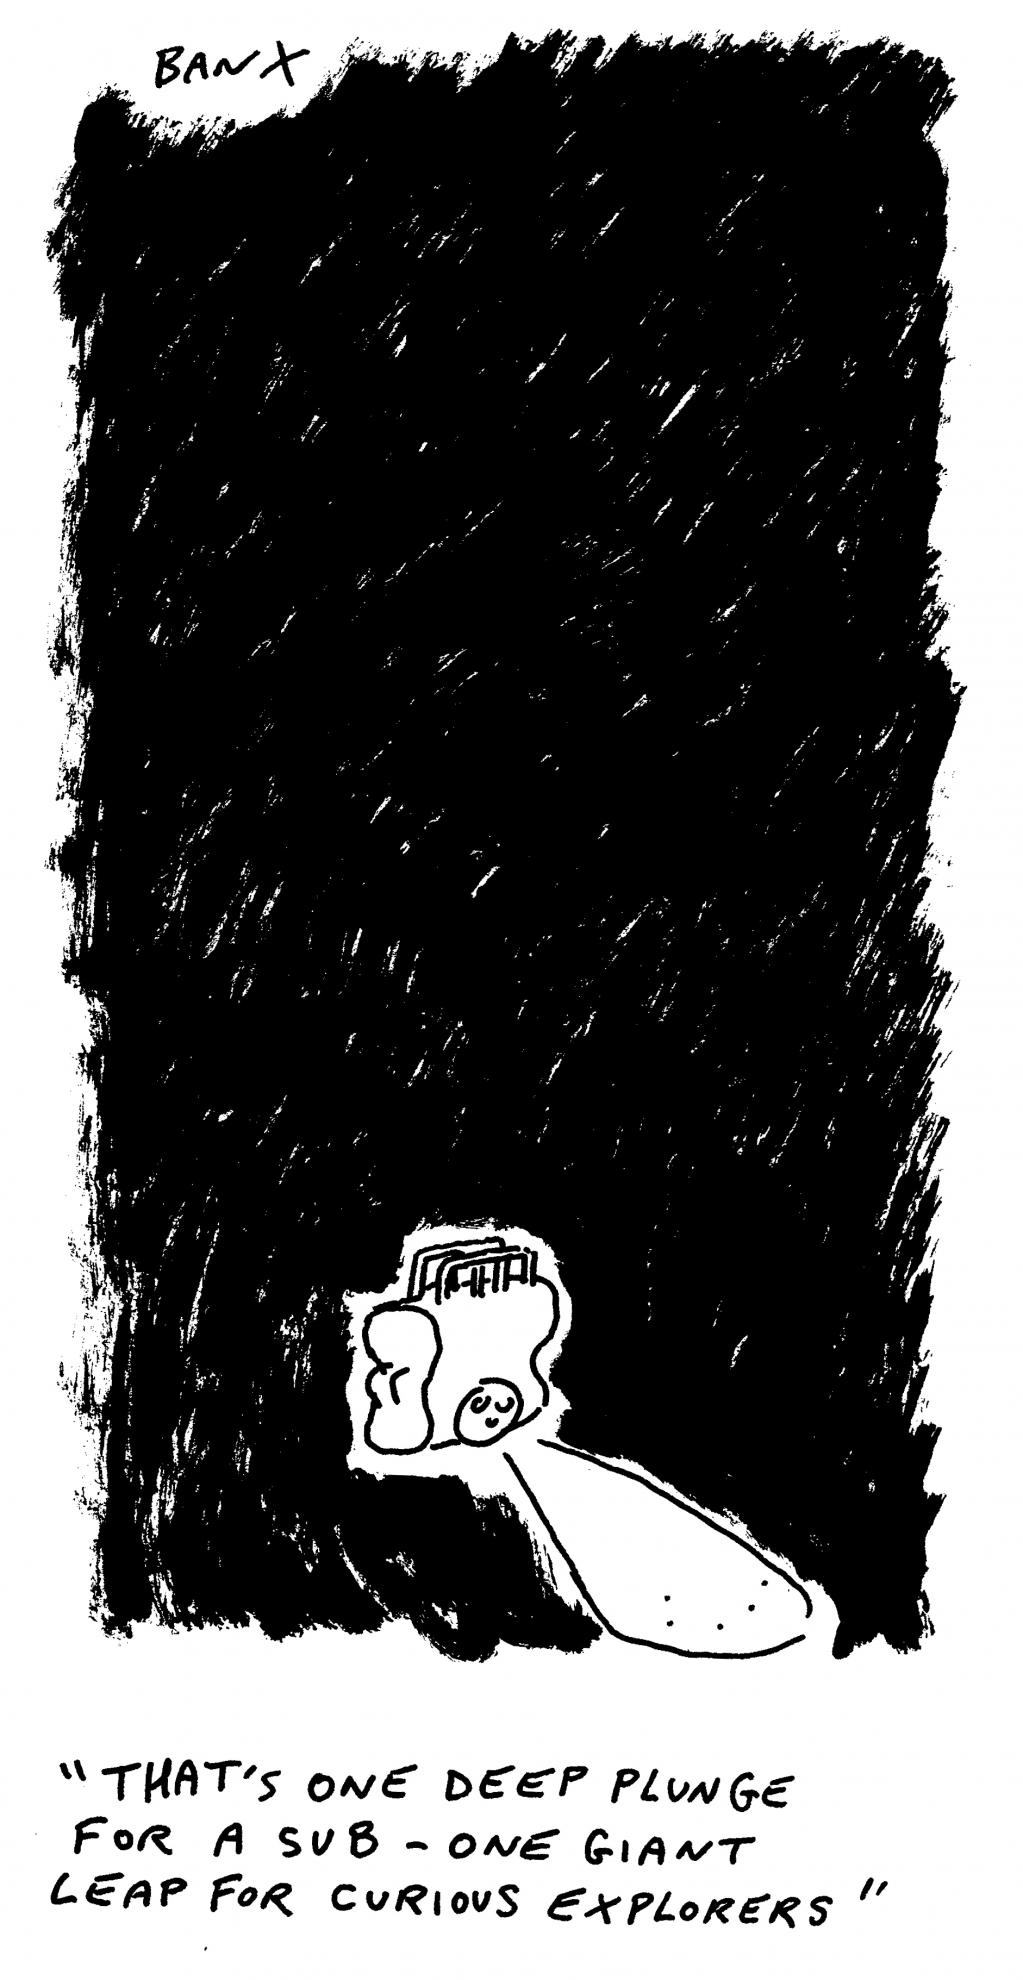 Cartoon by Banx